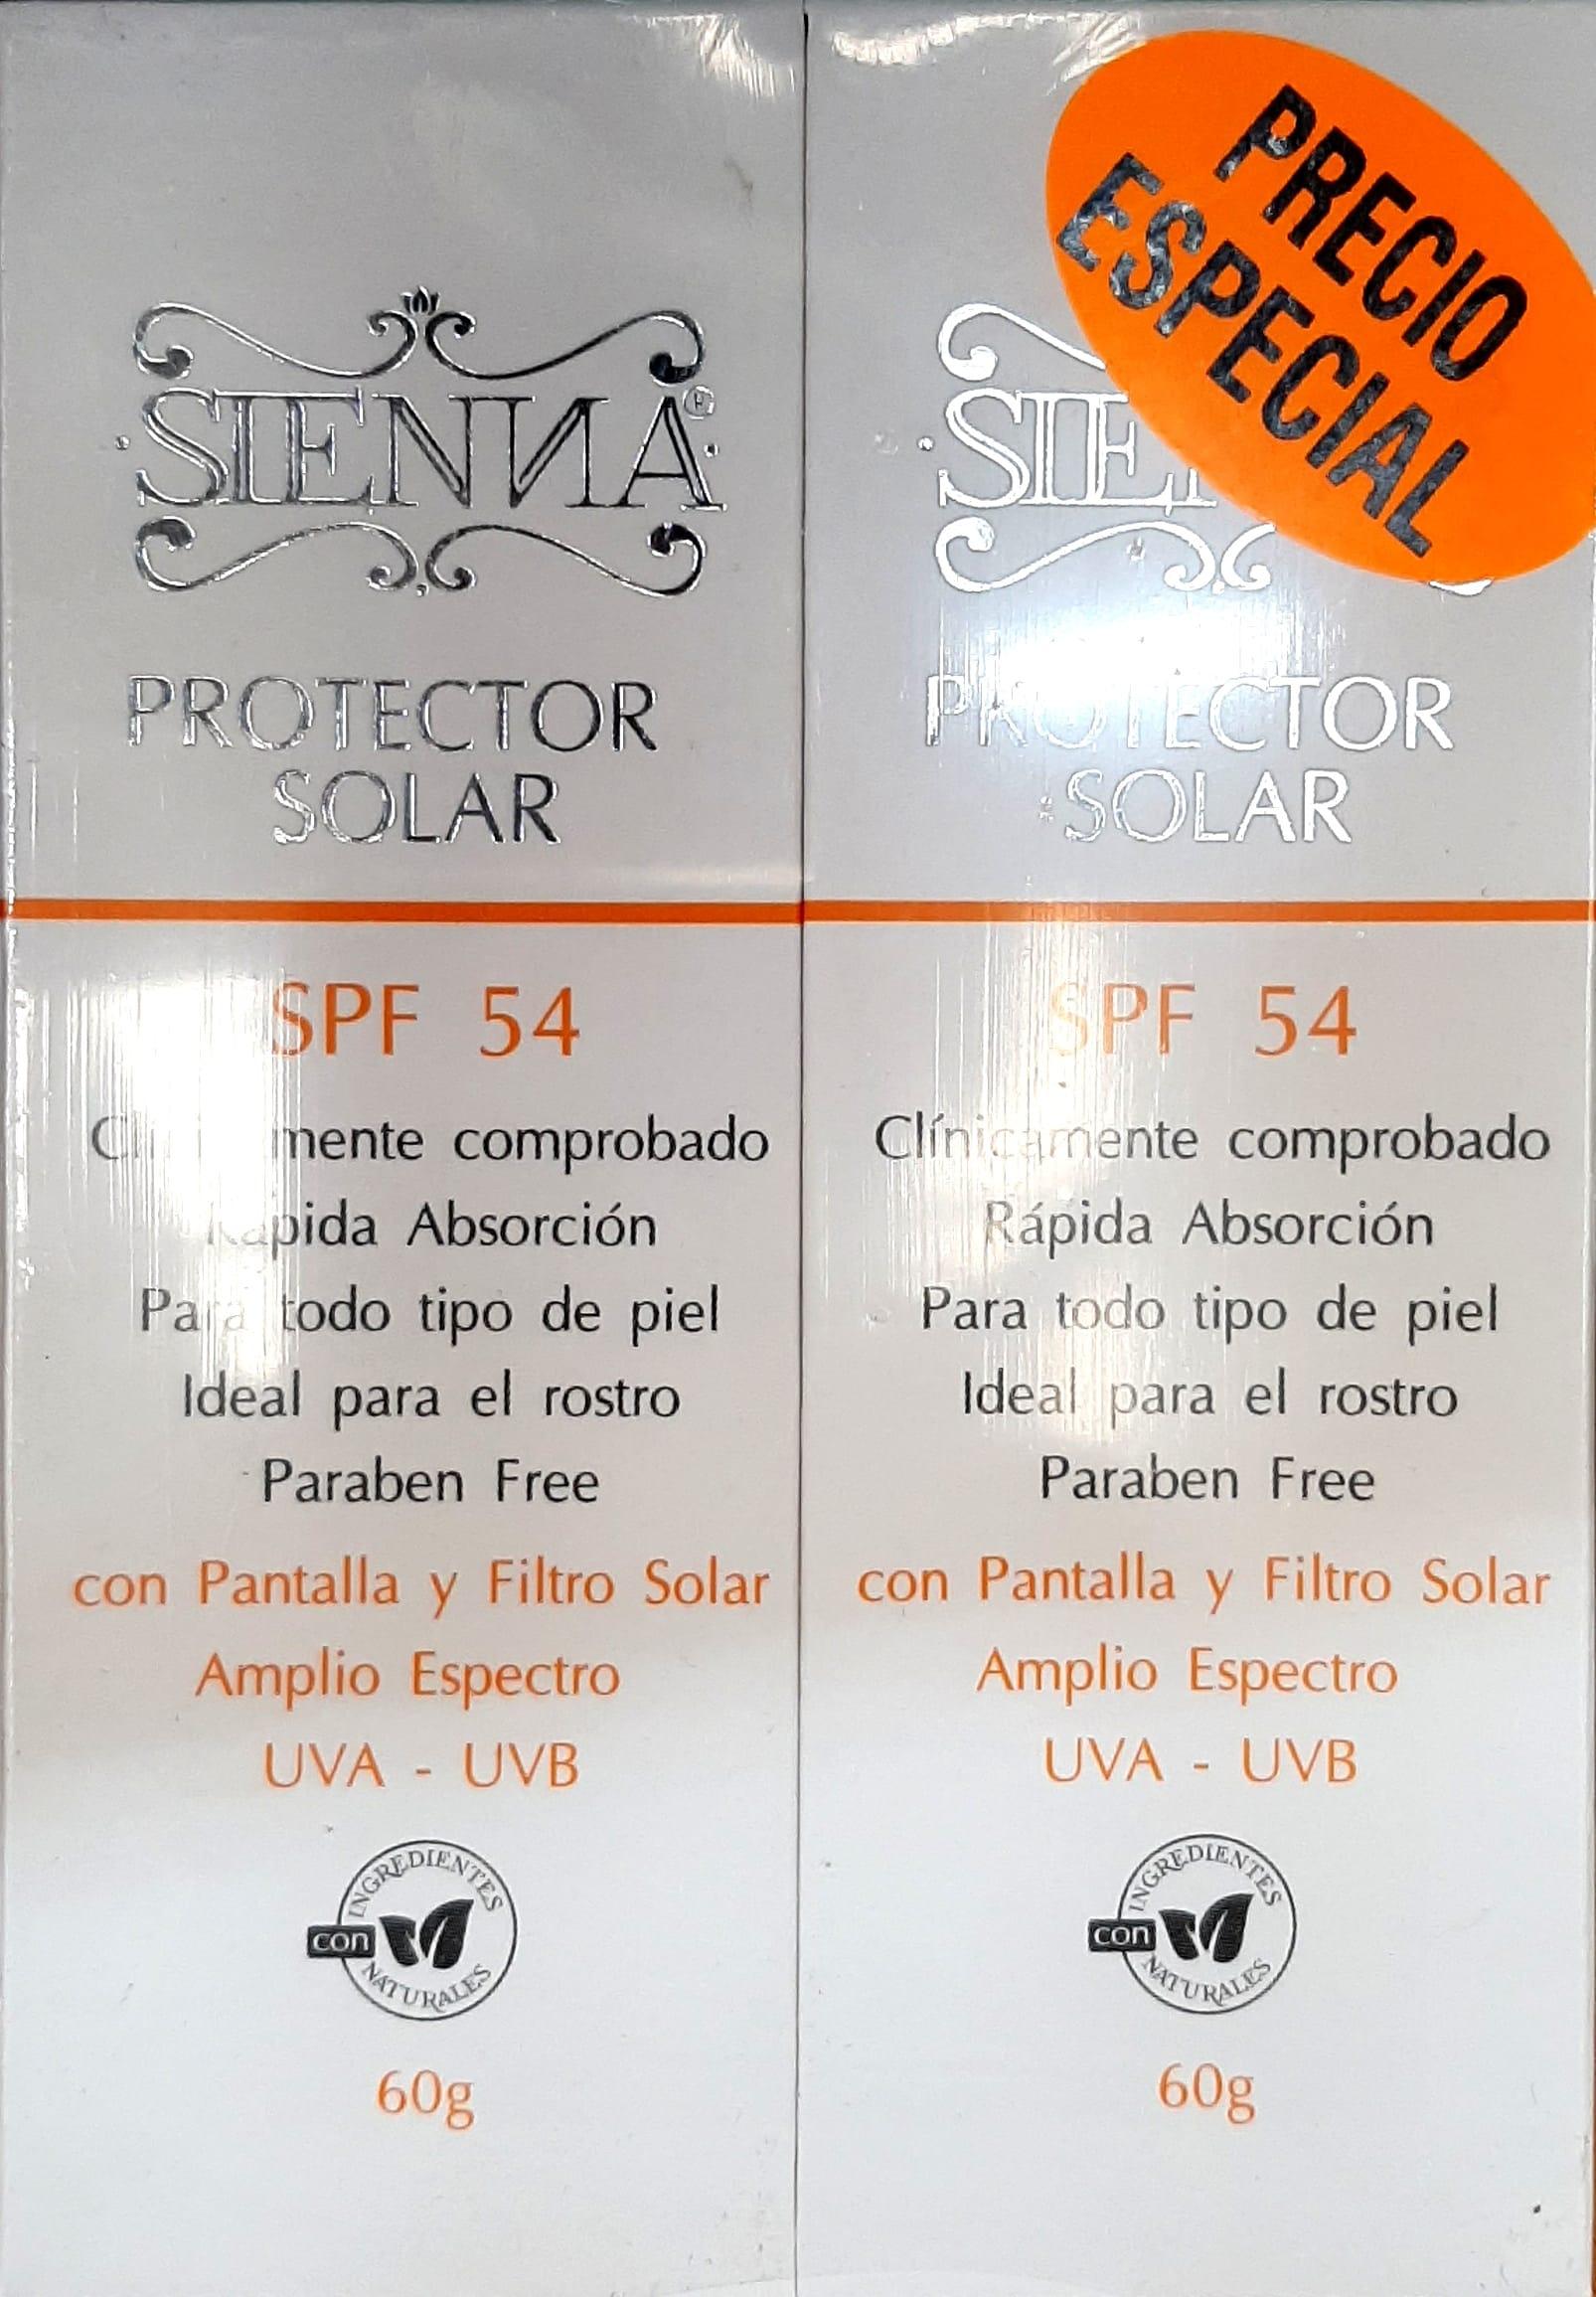 duo Pack Bloqueador Sienna Spf54